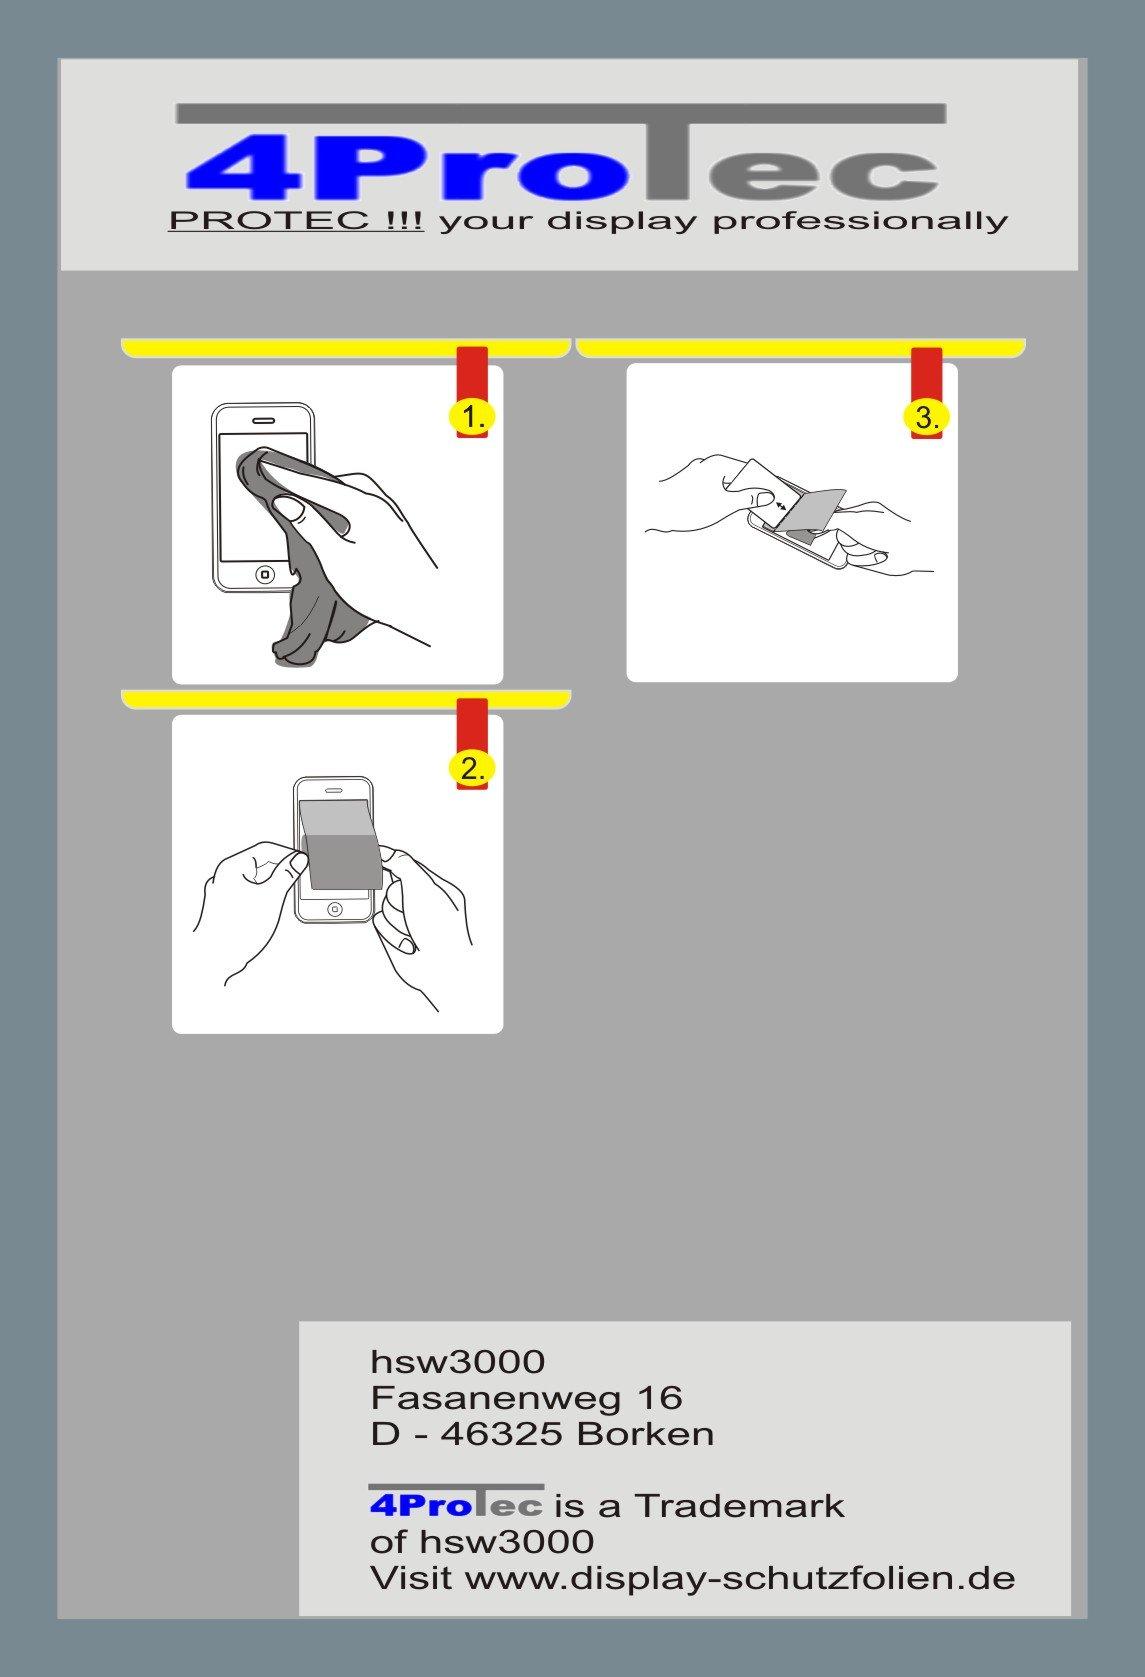 2X-Crystal-Clear-klar-Schutzfolie-fr-Siemens-TE653501DE-EQ6-Plus-S300-Kaffeevollautomat-Displayschutzfolie-Bildschirmschutzfolie-Schutzhlle-Displayschutz-Displayfolie-Folie